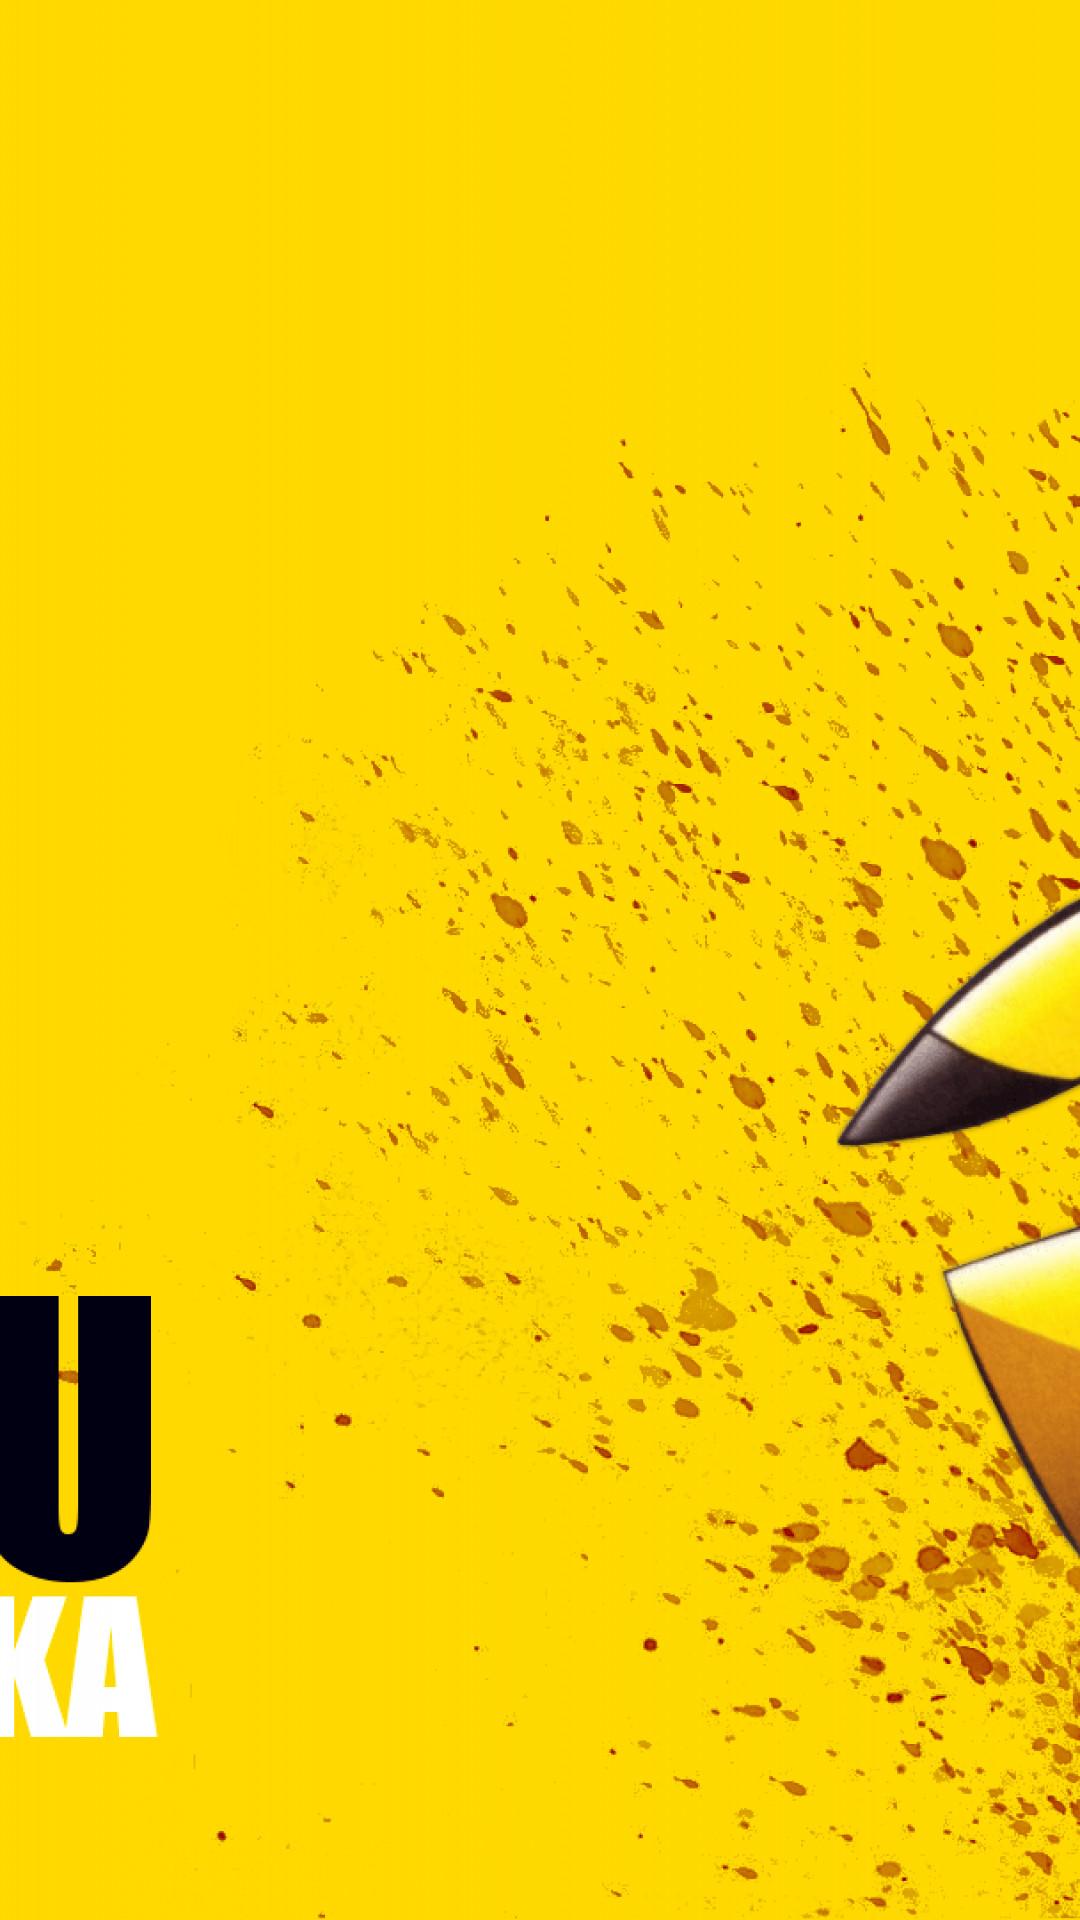 pikachu wallpaper download